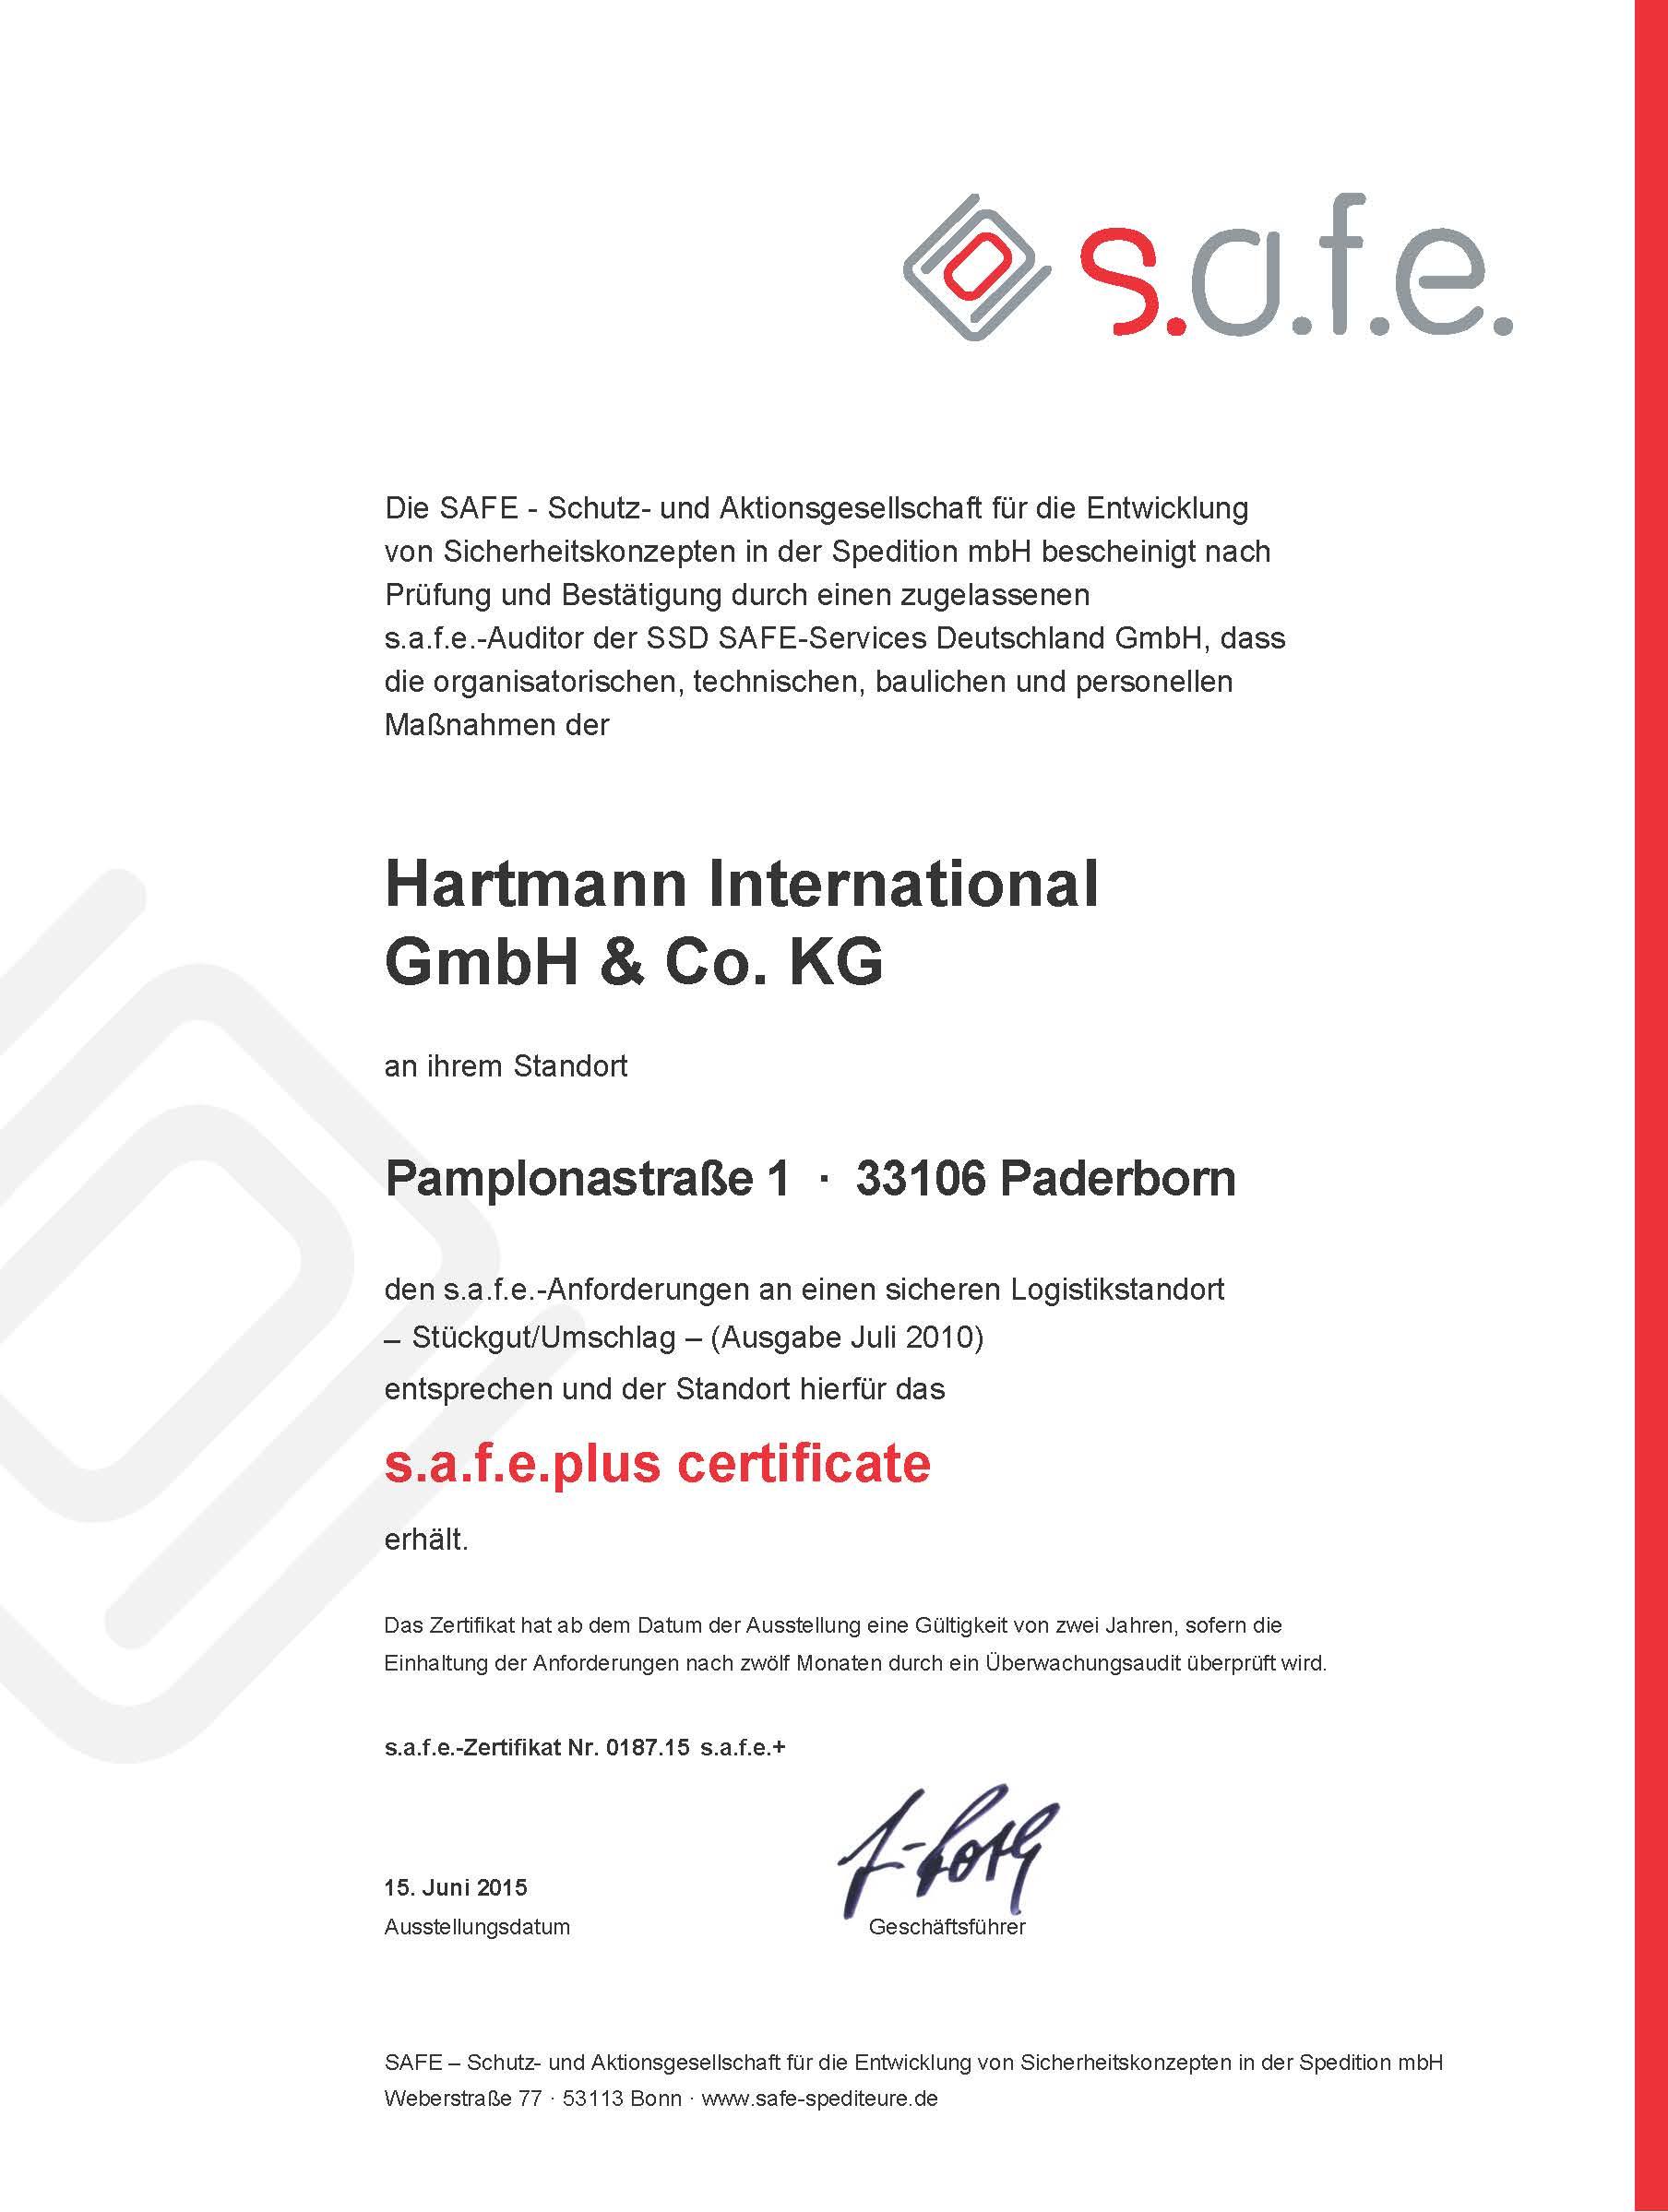 safe plus Hartmann Pamplonastr. 2015 SU